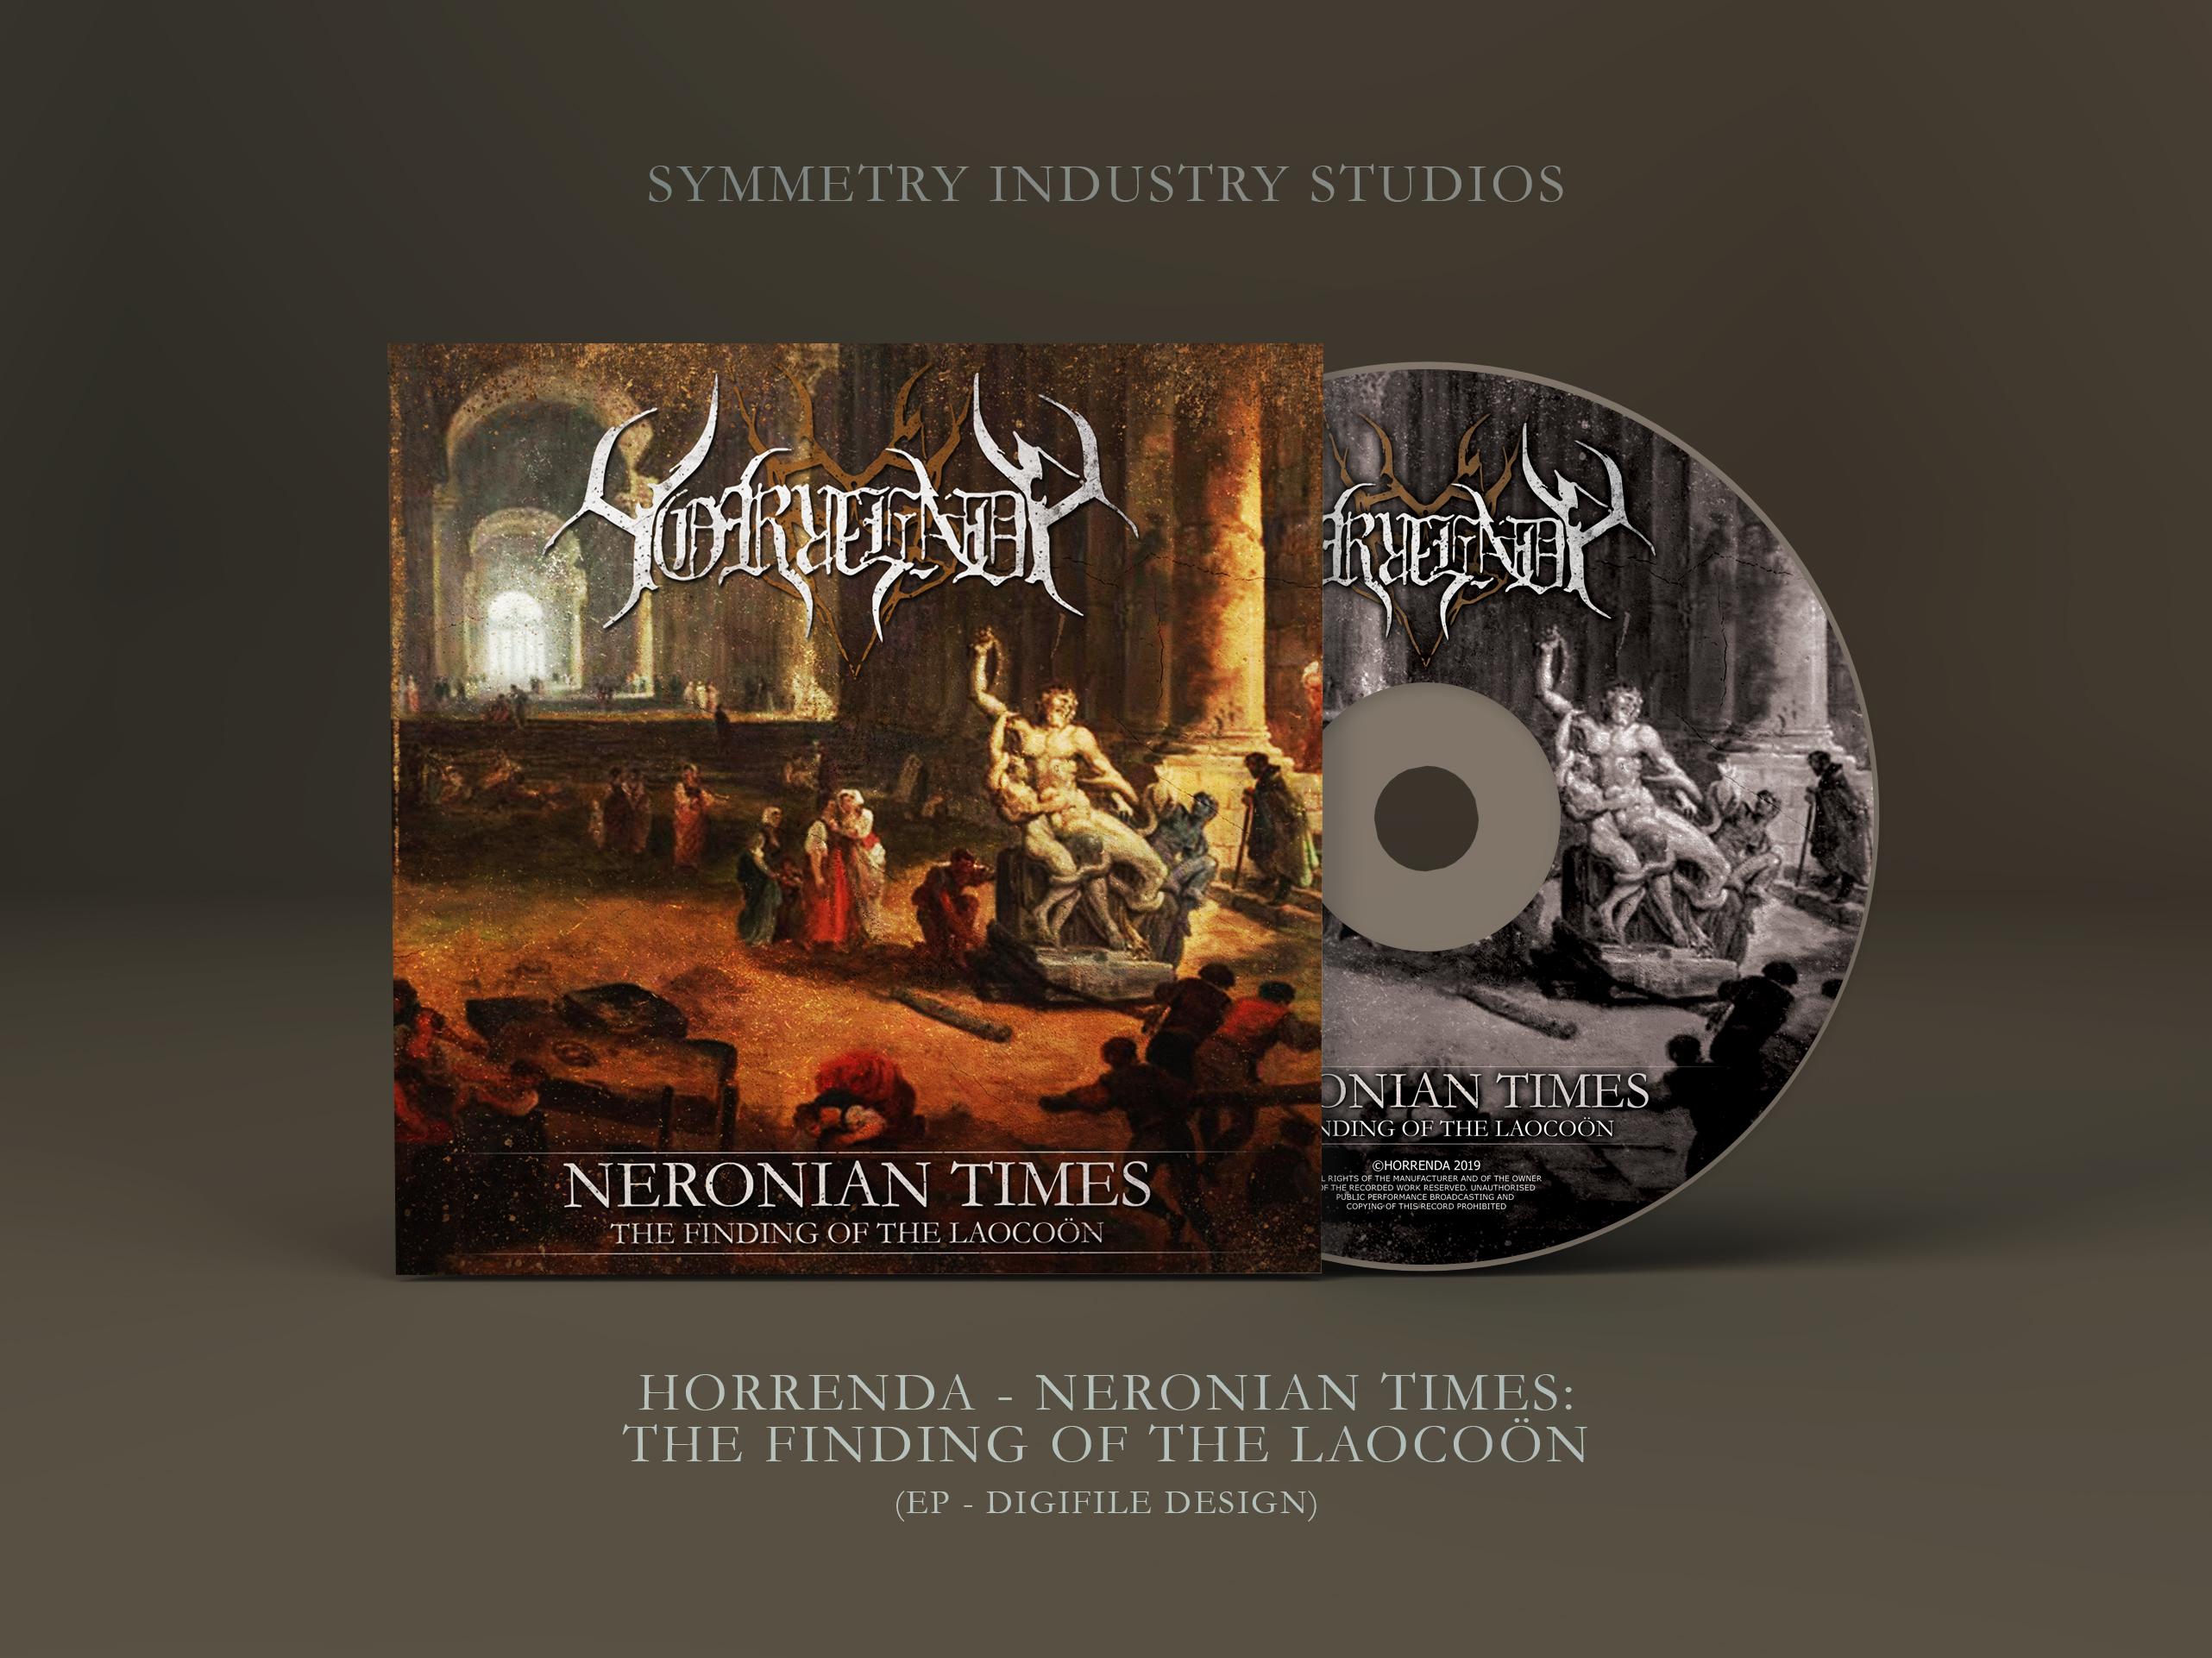 Horrenda - Neronian Times (Remaster) Mockup